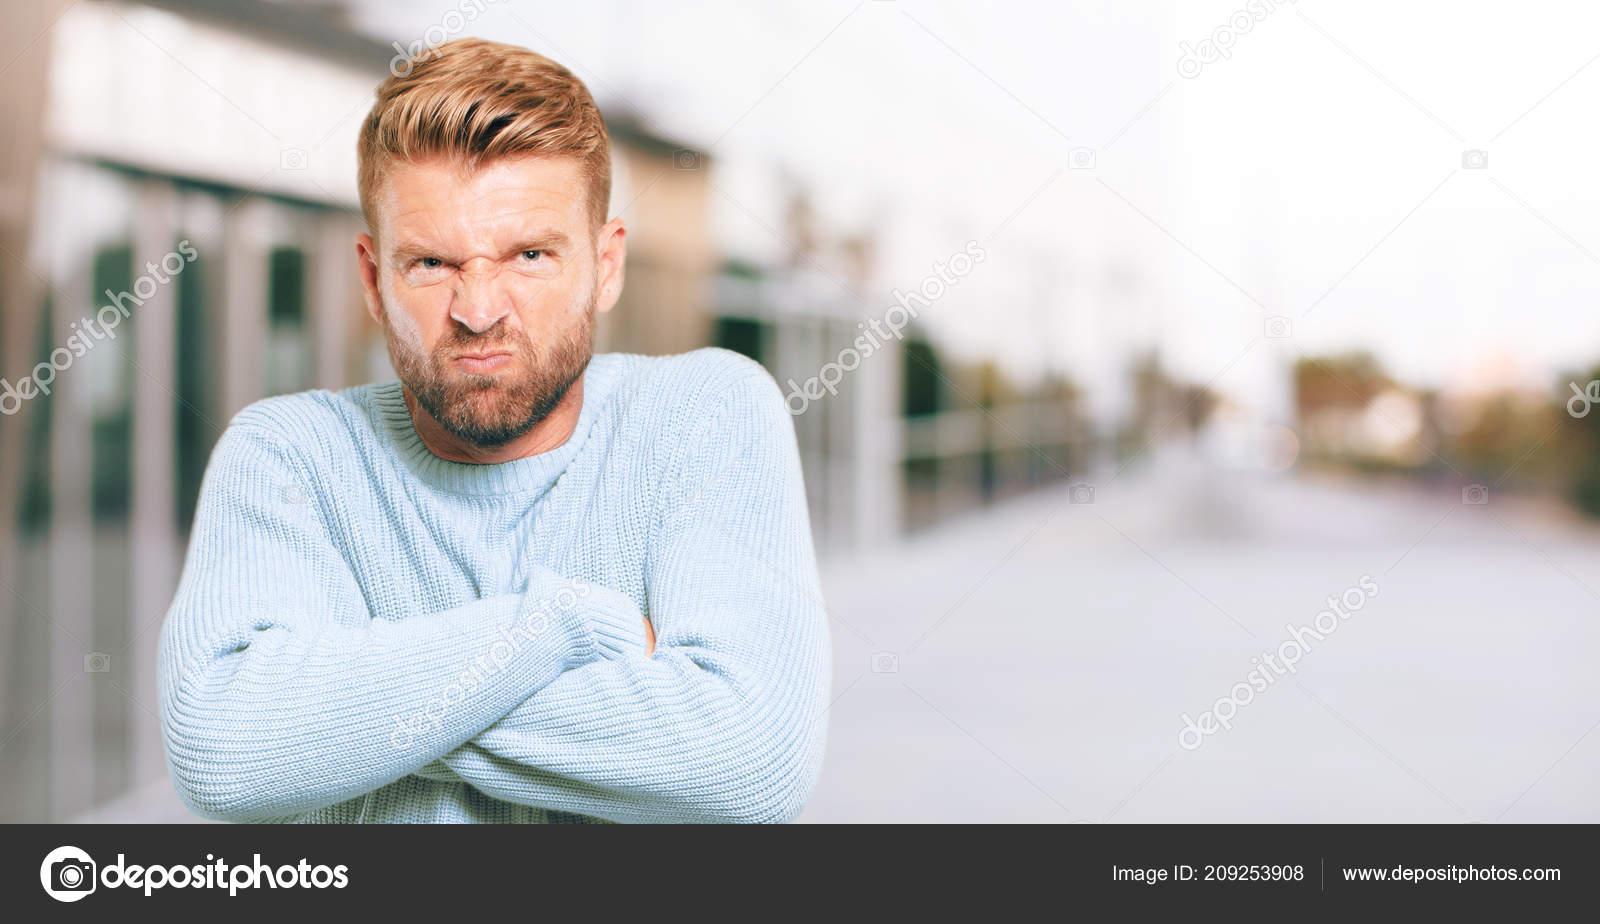 feeling upset and angry - HD1600×924